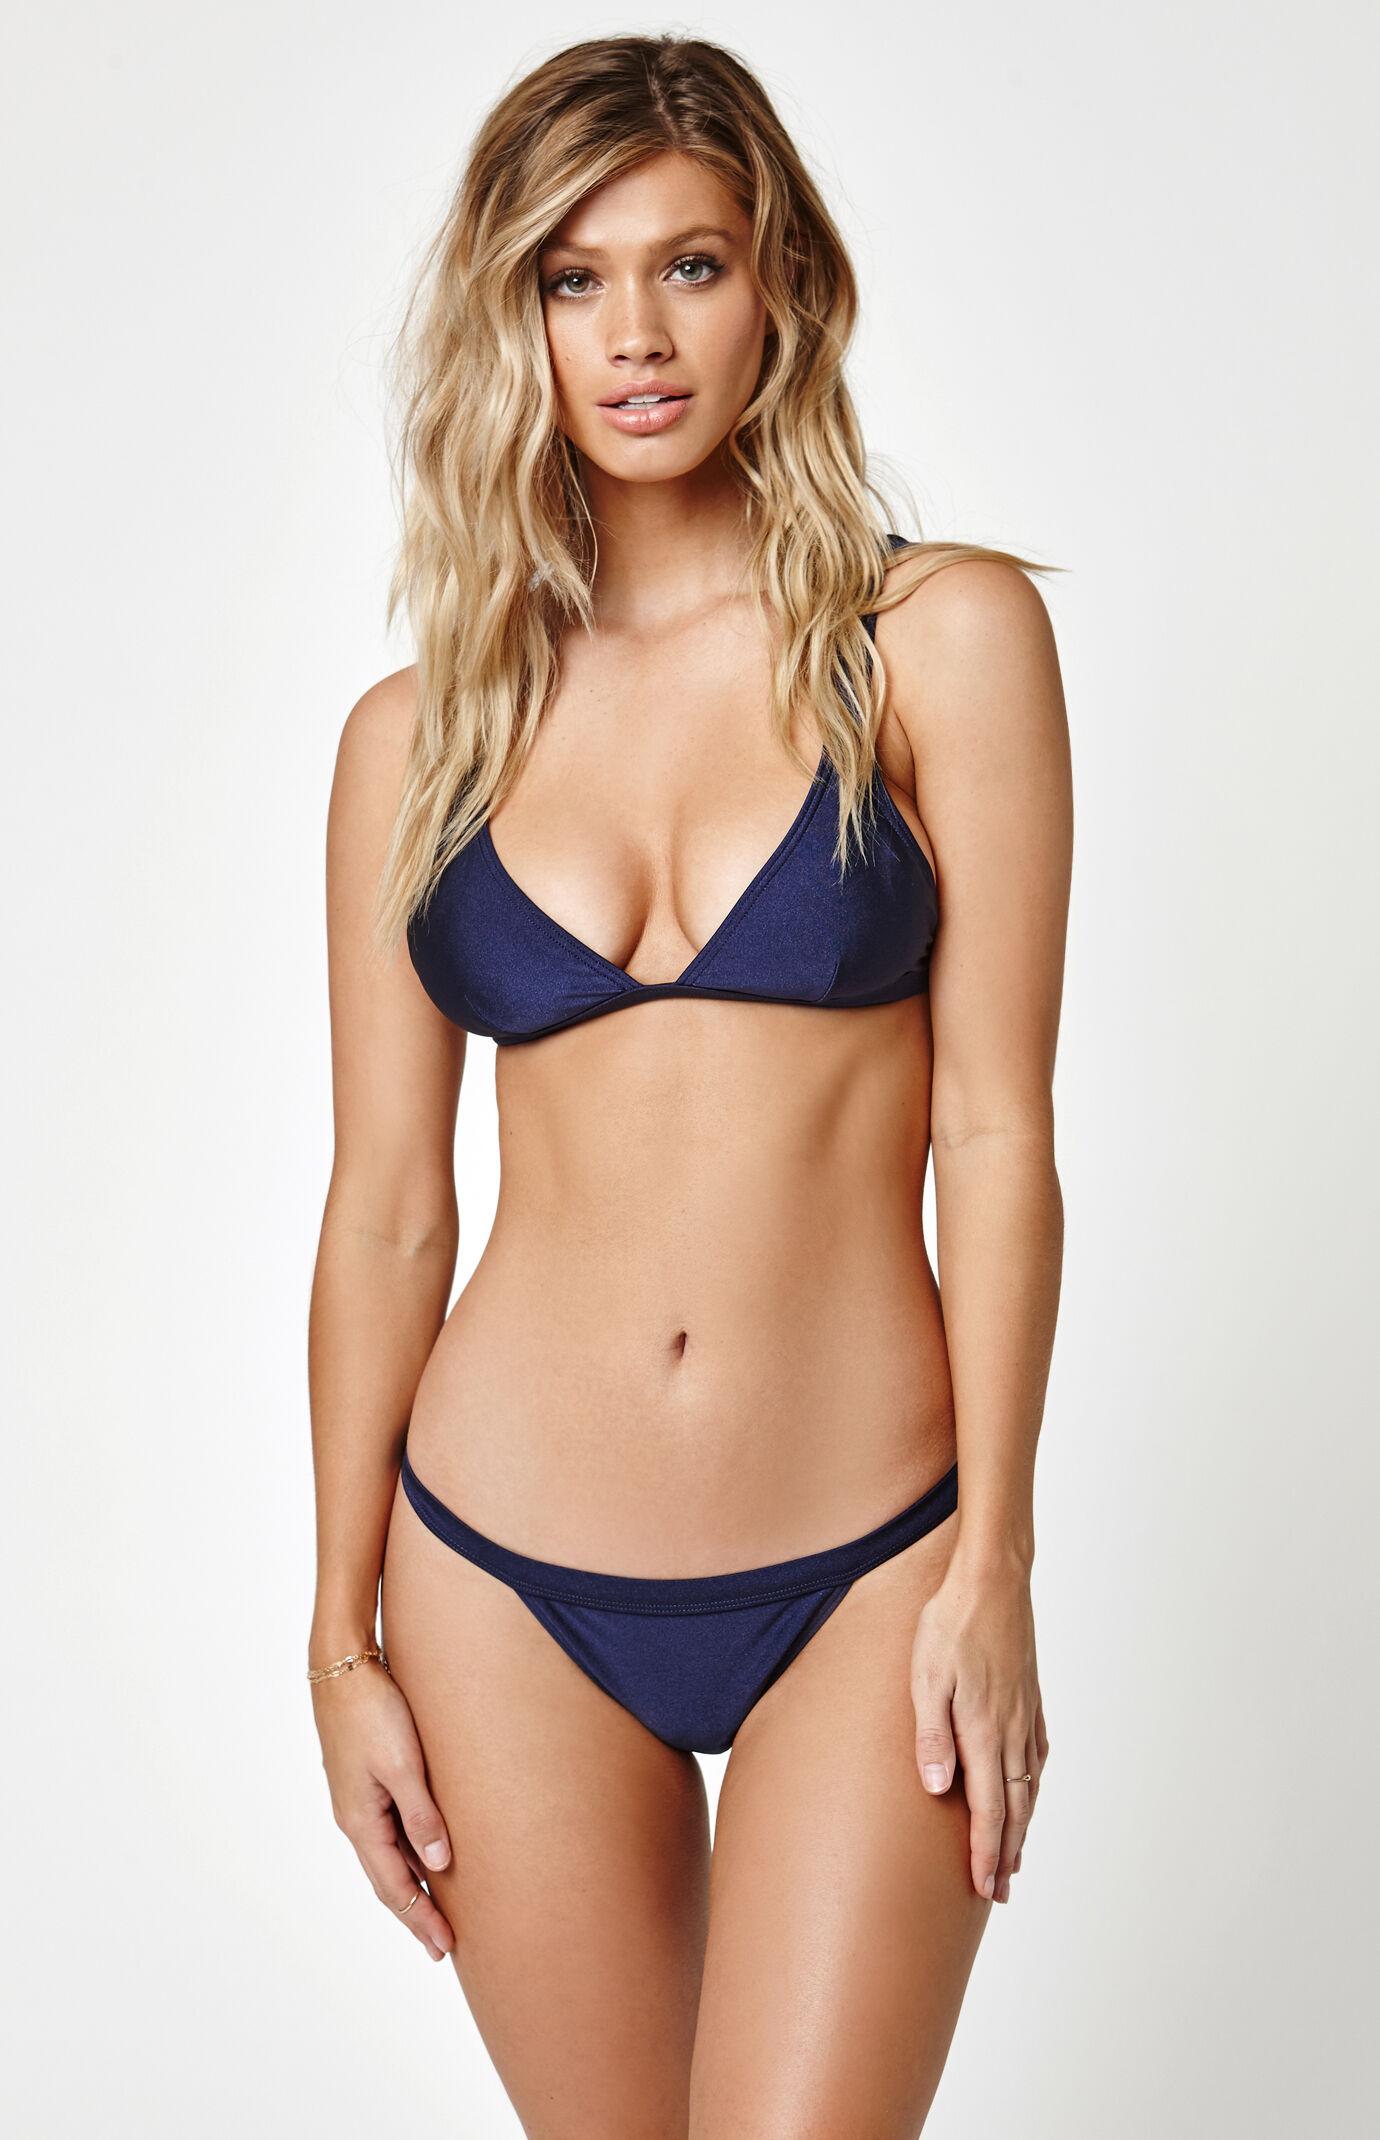 MinkPink Lucky Star Triangle Bikini Top - Indigo Blue 7159478